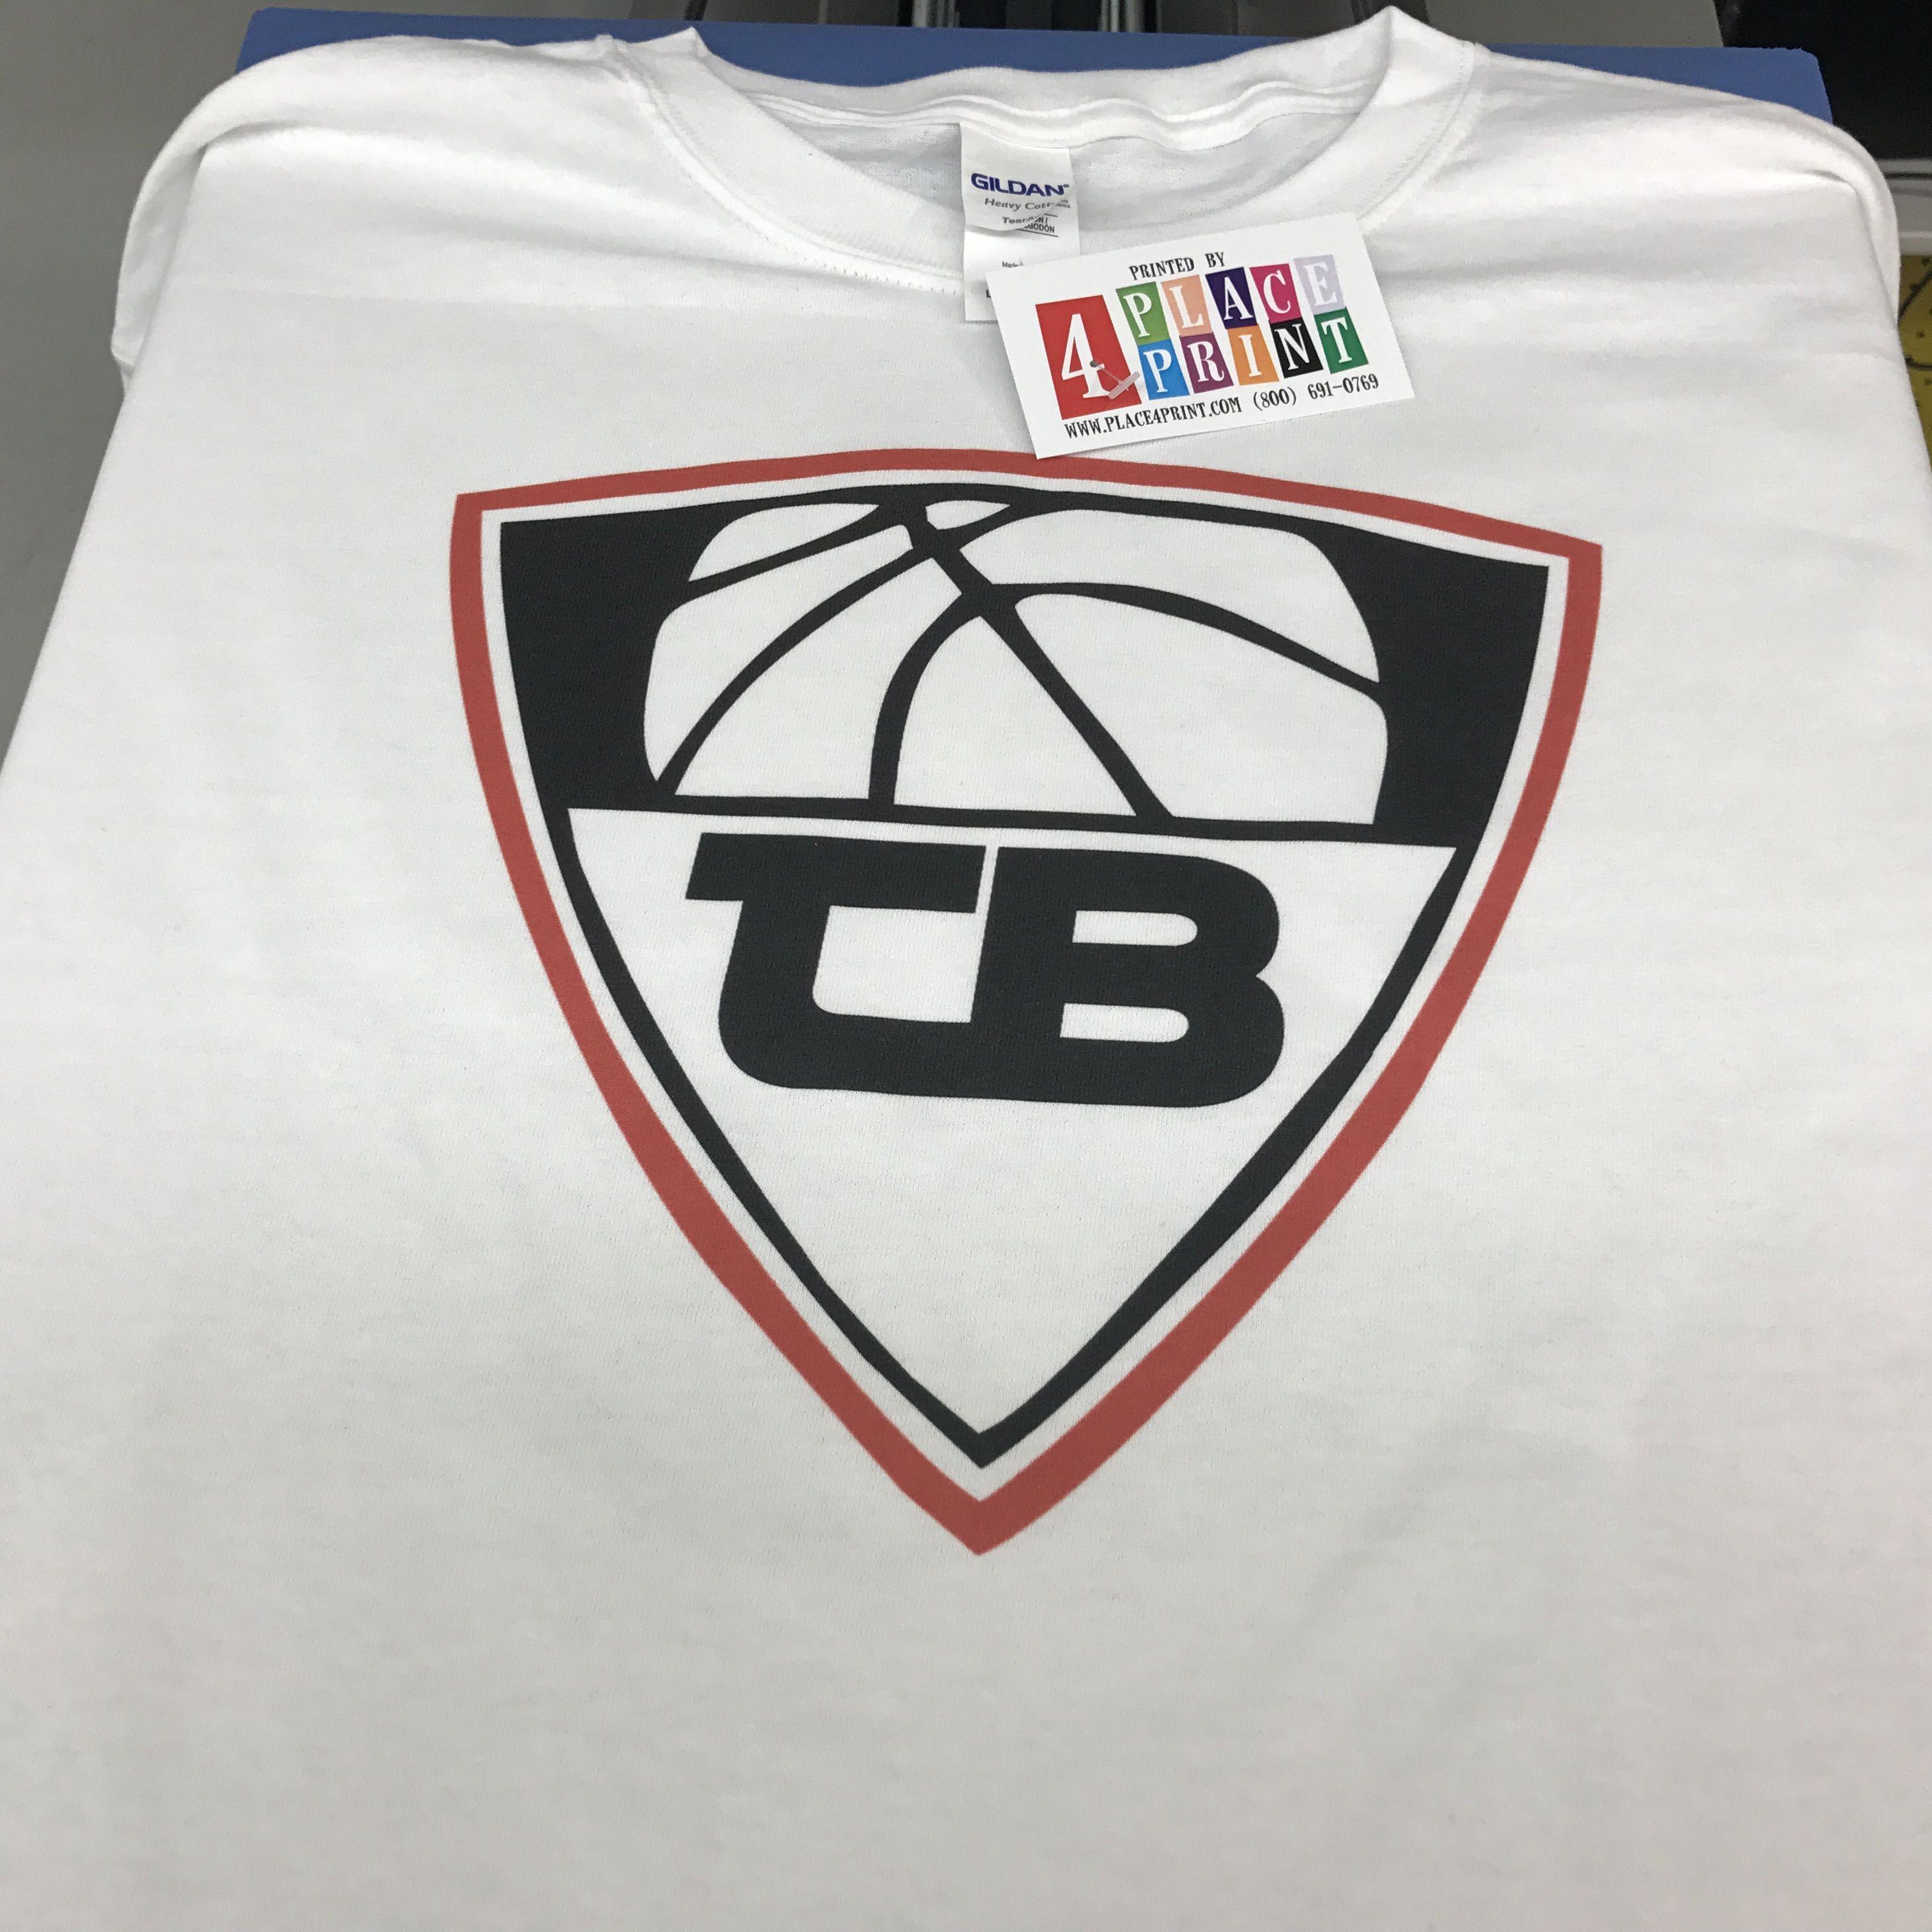 Cheap Custom T Shirts No Minimum Order Unlimited Colors Starting At 11 00 We Drop Ship Dtg Printing Scre Custom T Shirt Printing Custom Tshirts Shirts